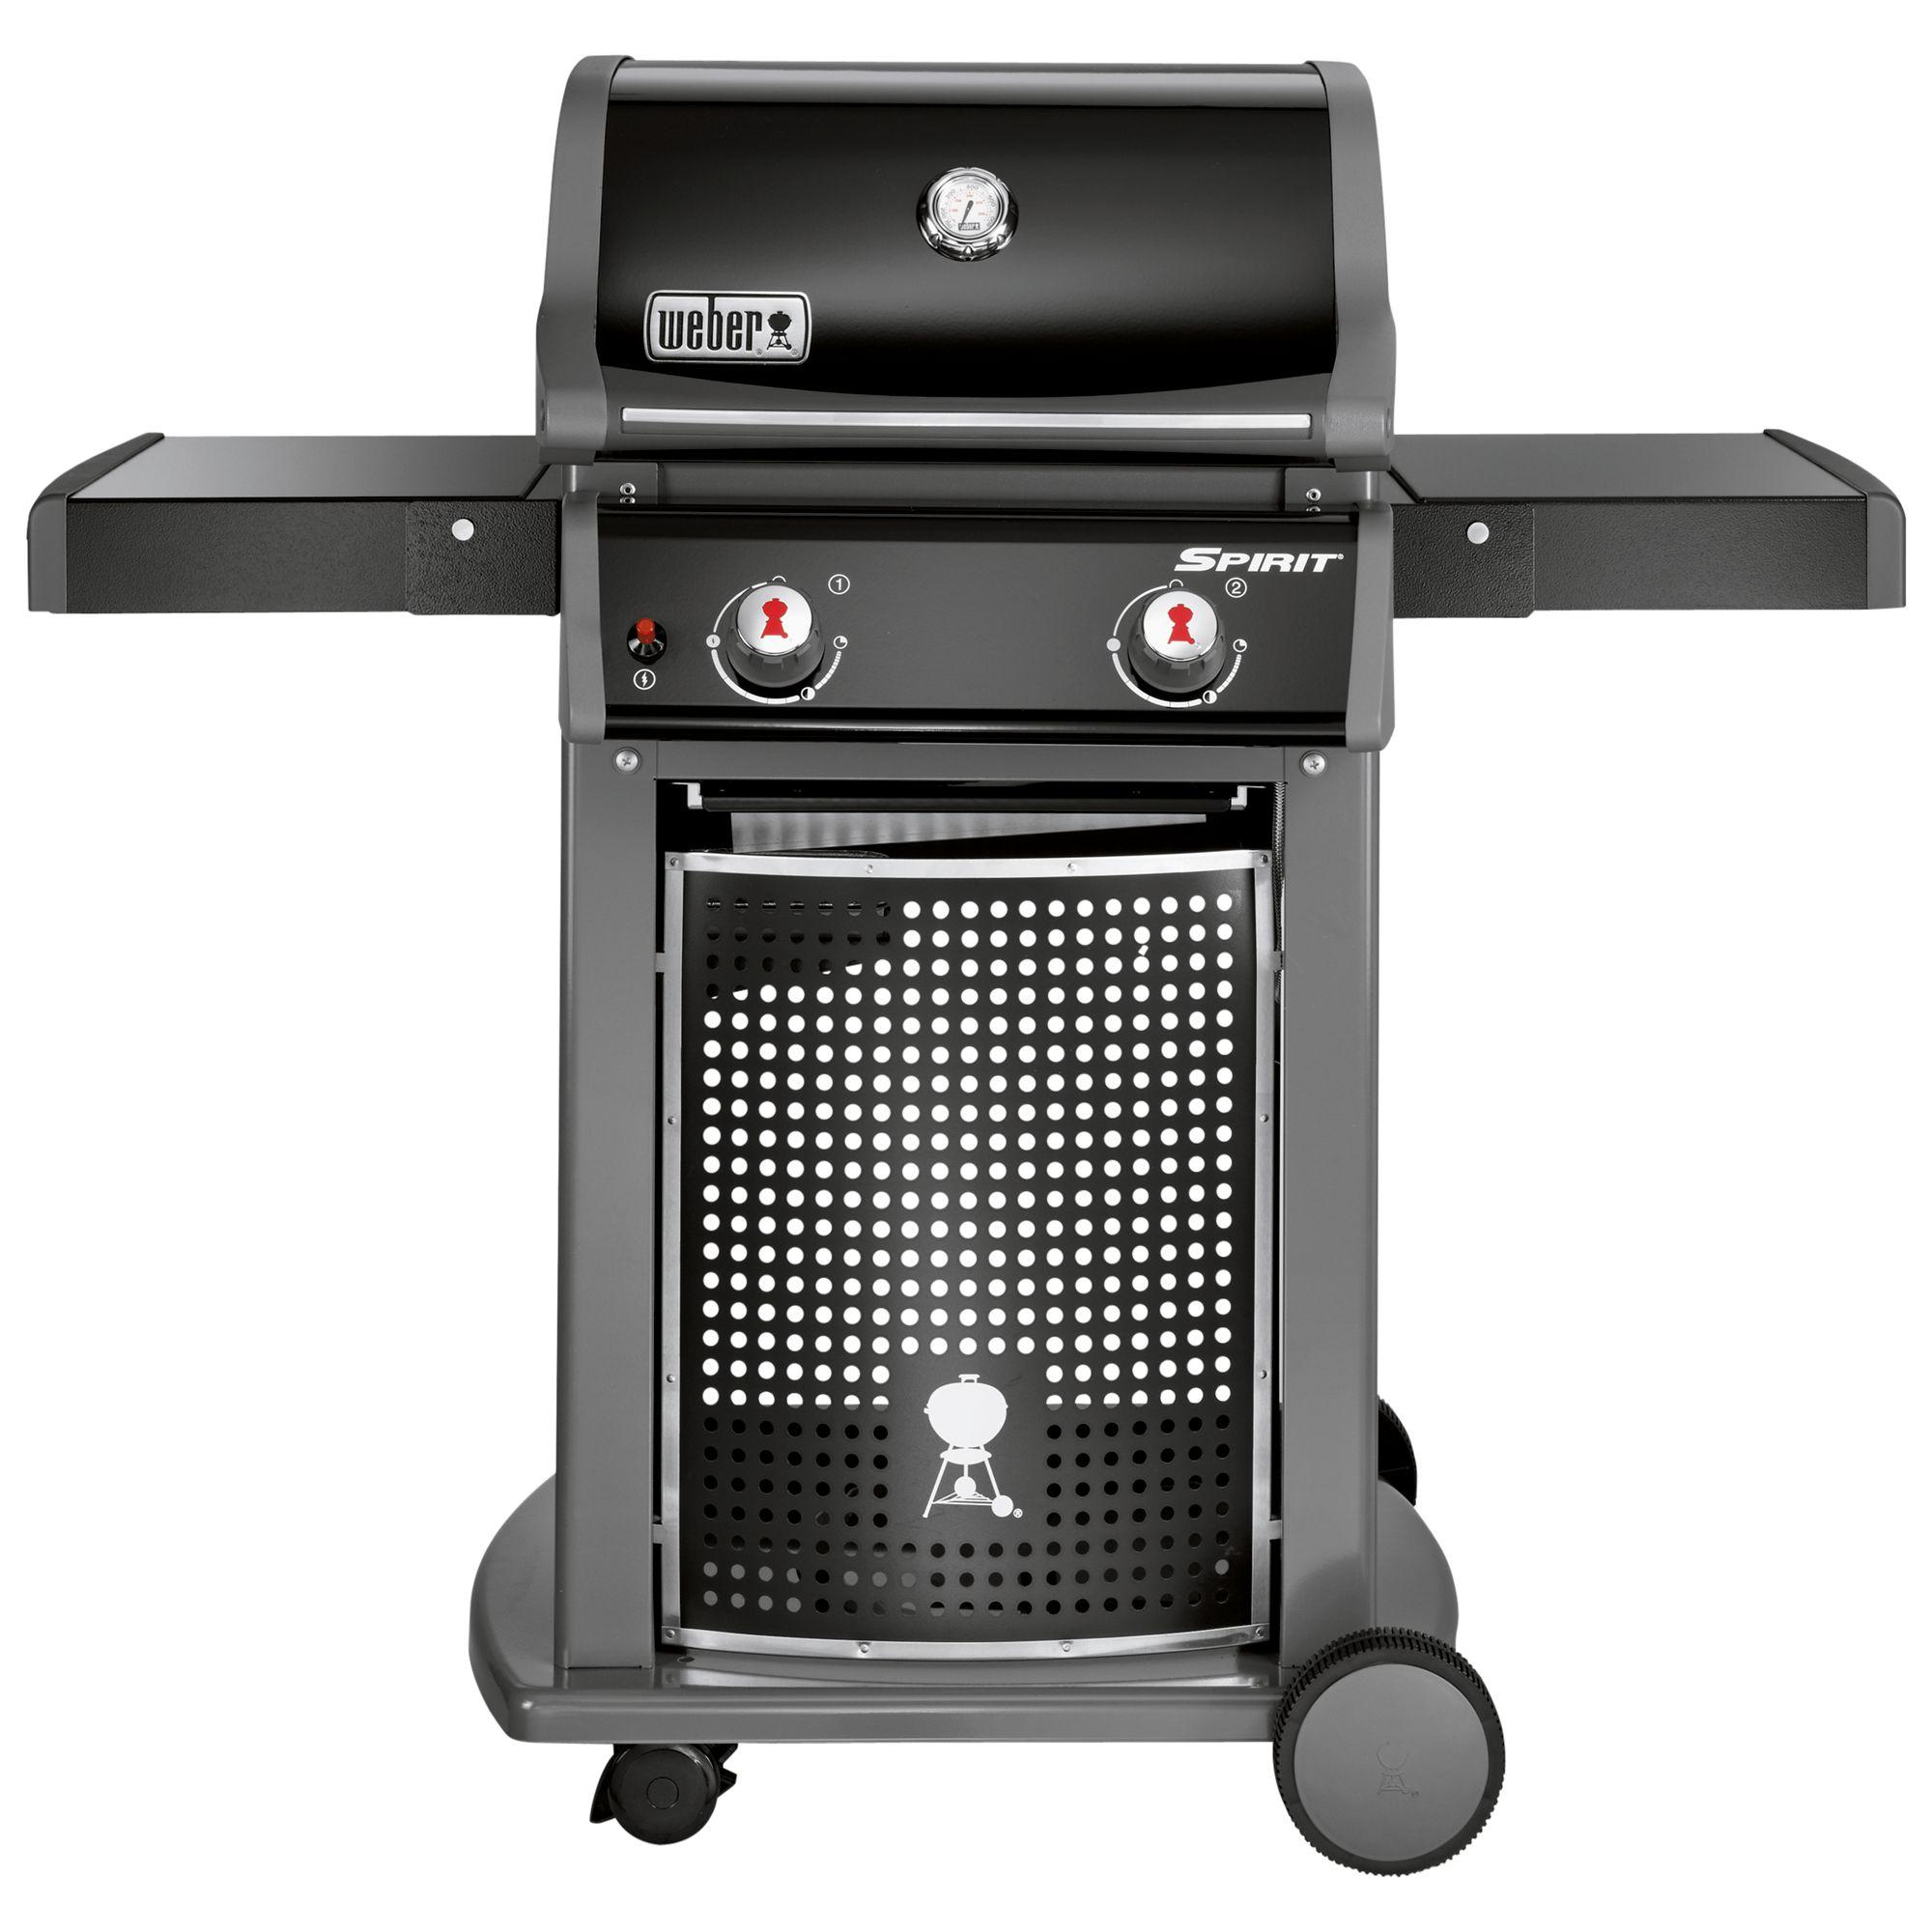 Weber Spirit Classic E210 Gas Barbecue